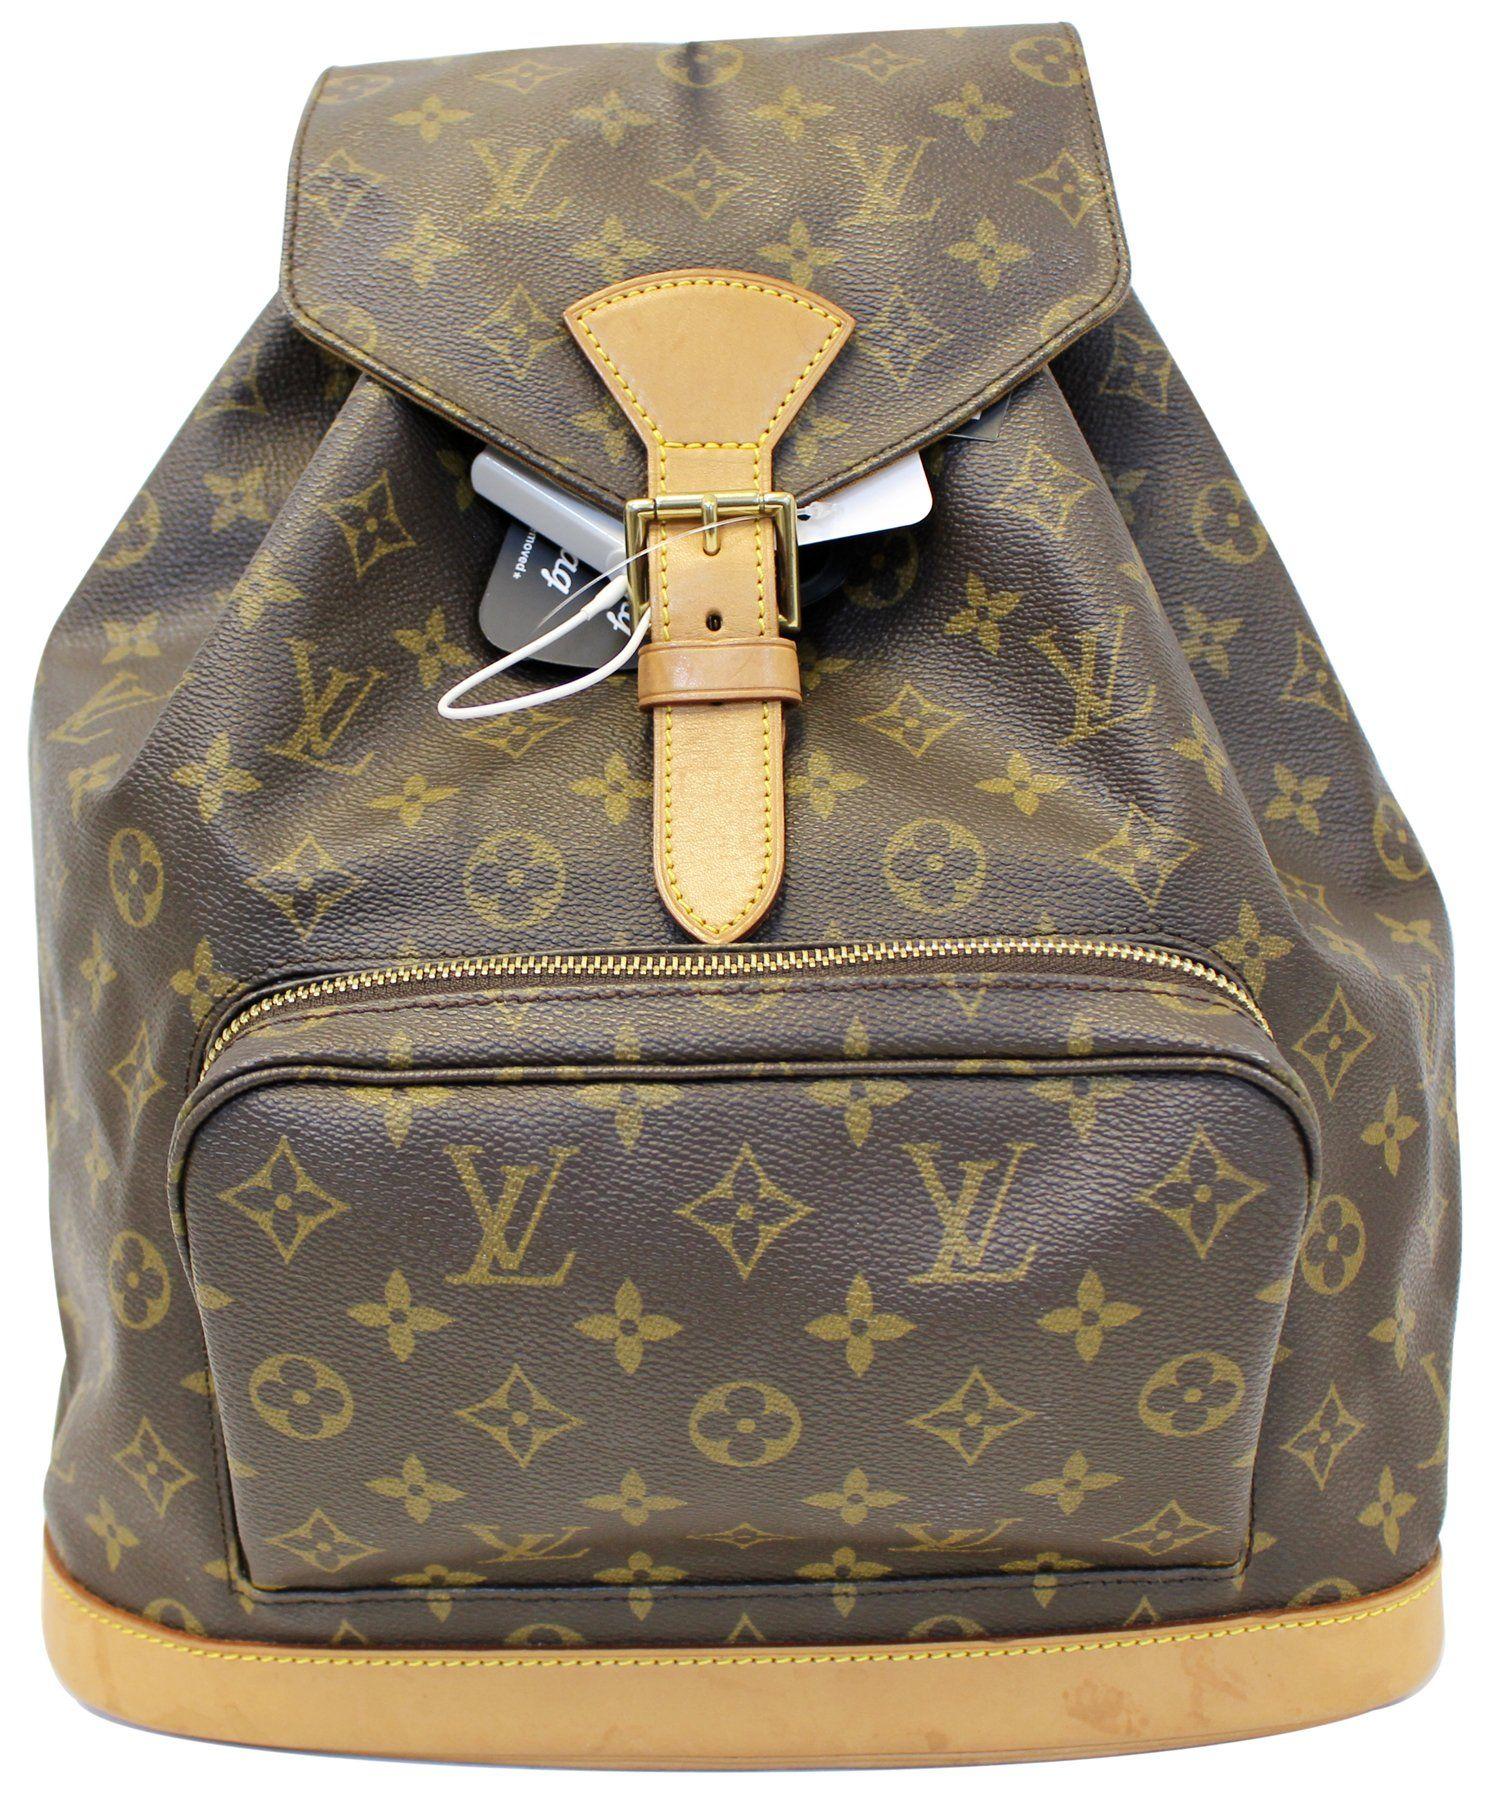 557ca4cd43c08 LOUIS VUITTON Montsouris GM Monogram Canvas Backpack Bag Brown